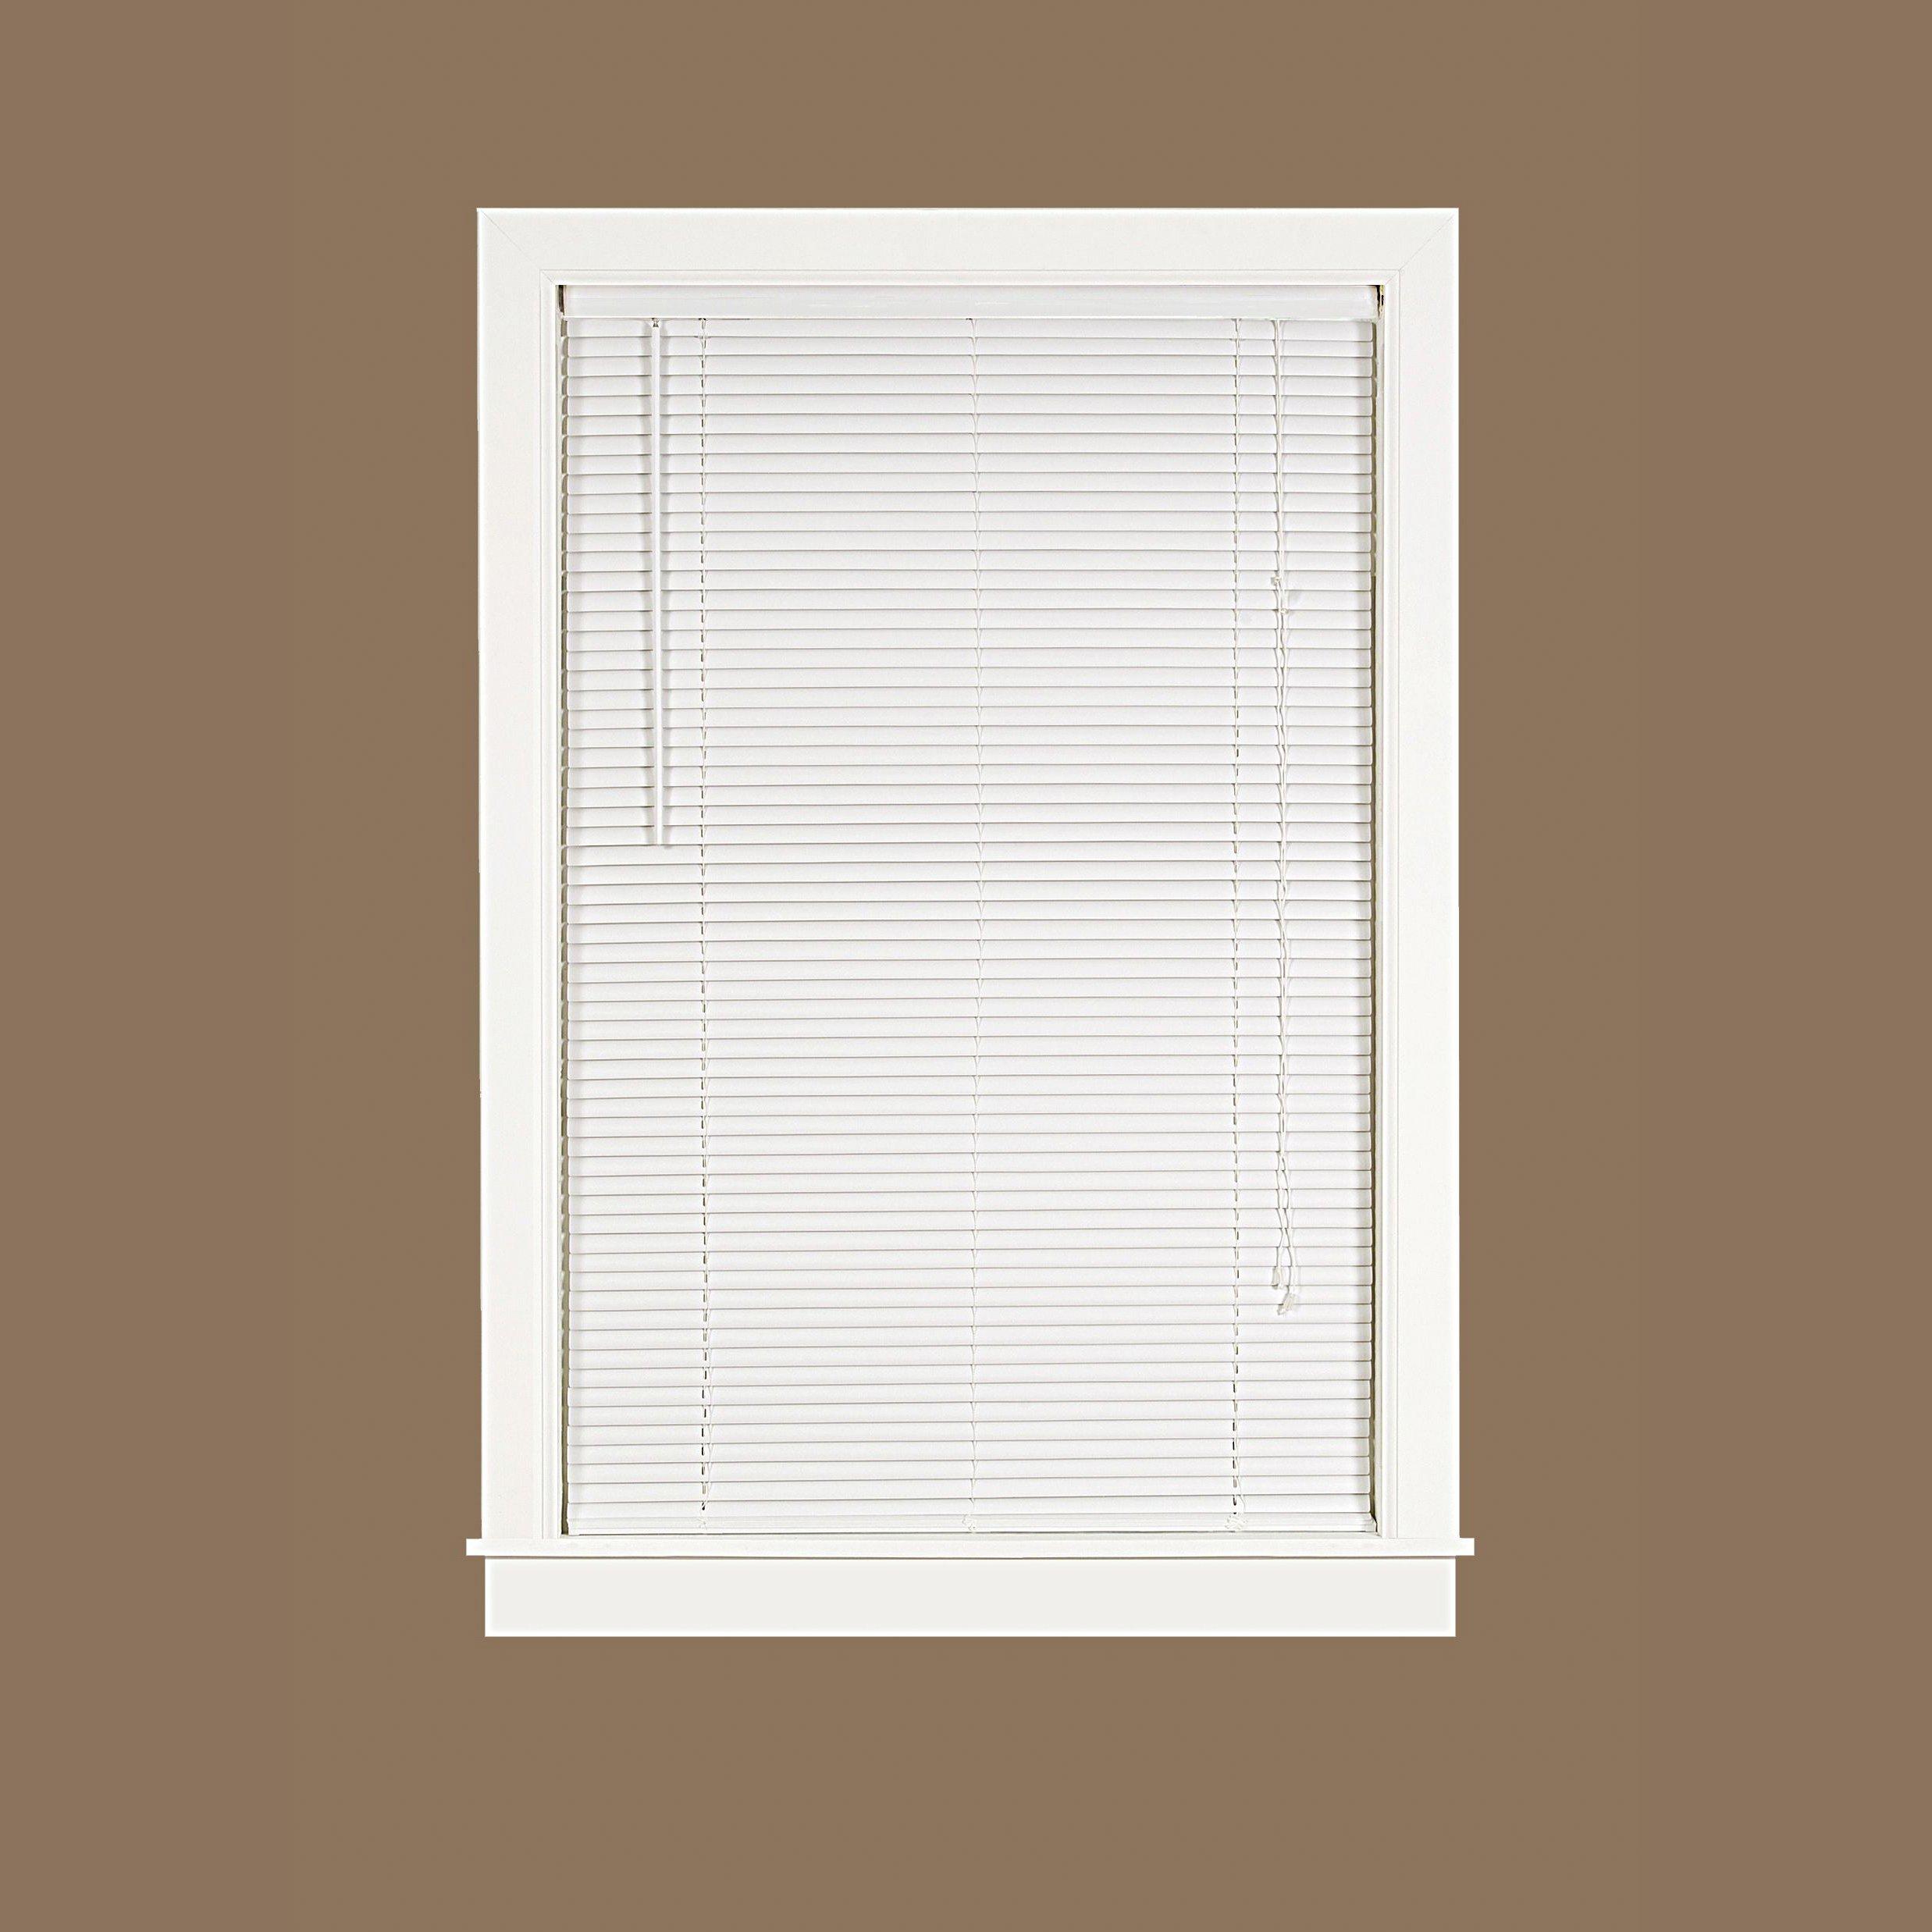 Ben & Jonah Ben&Jonah Deluxe Sundown 1'' Room Darkening Mini Blind 23x64-White Collection, Multi by Ben & Jonah